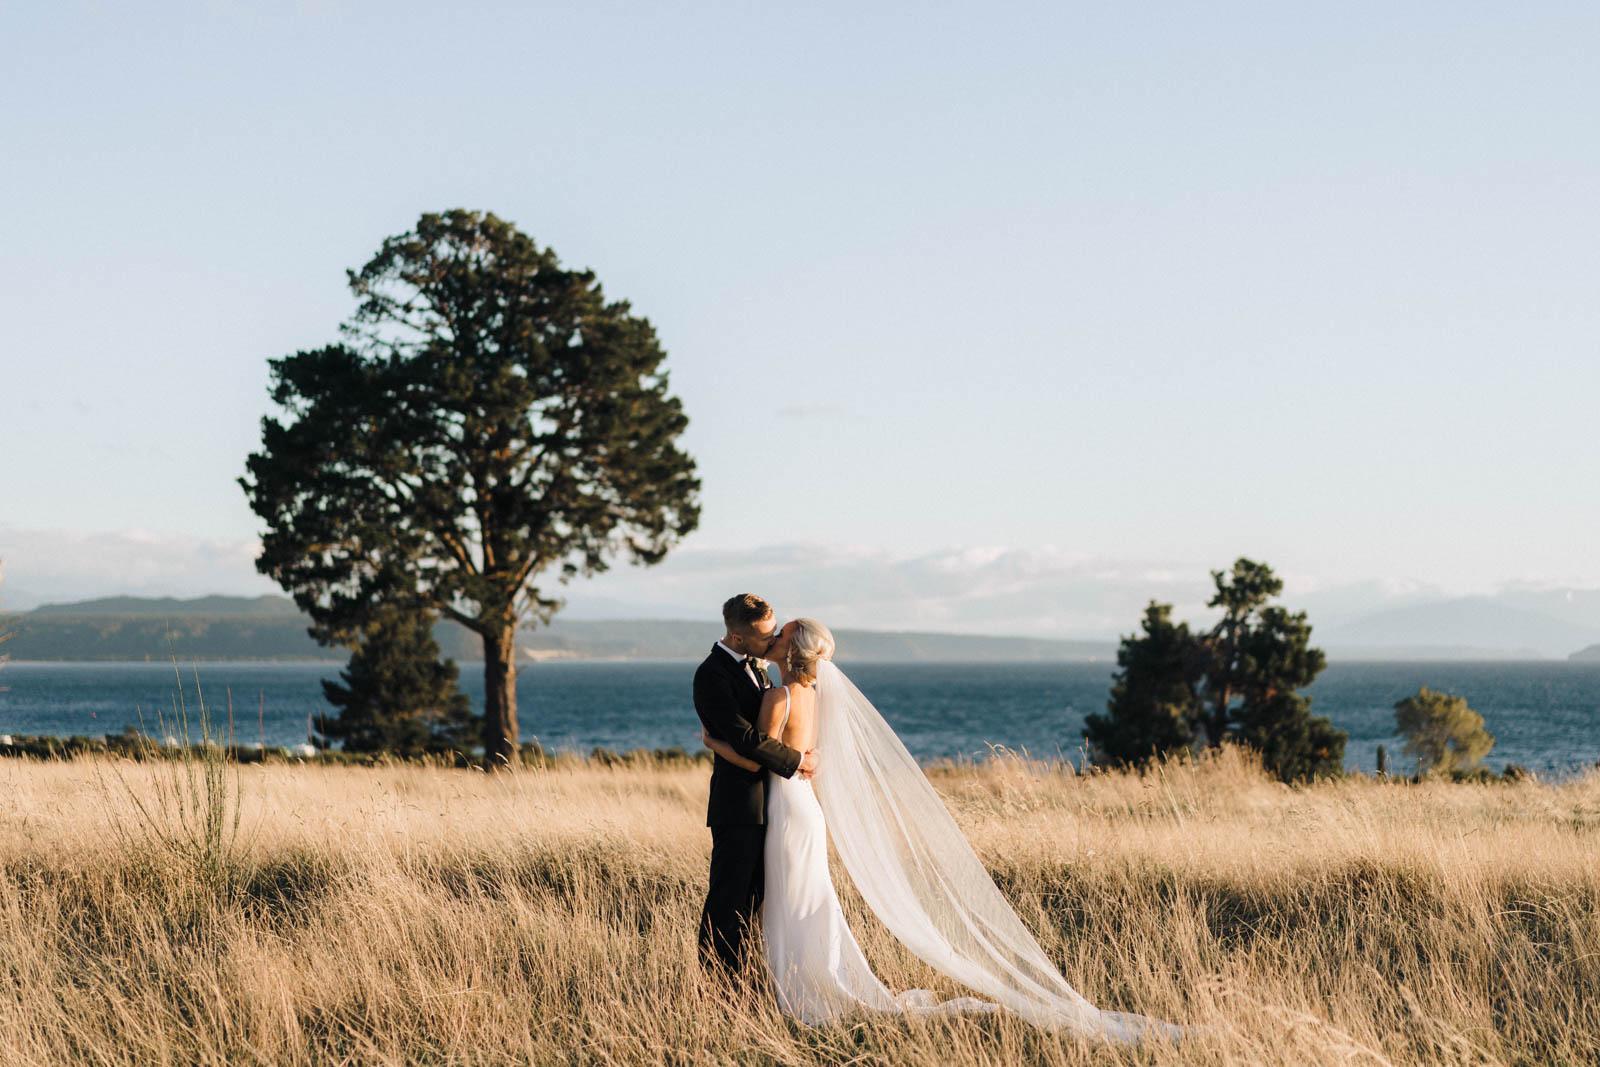 newfound-k-s-hilton-taupo-wedding-photographer-065